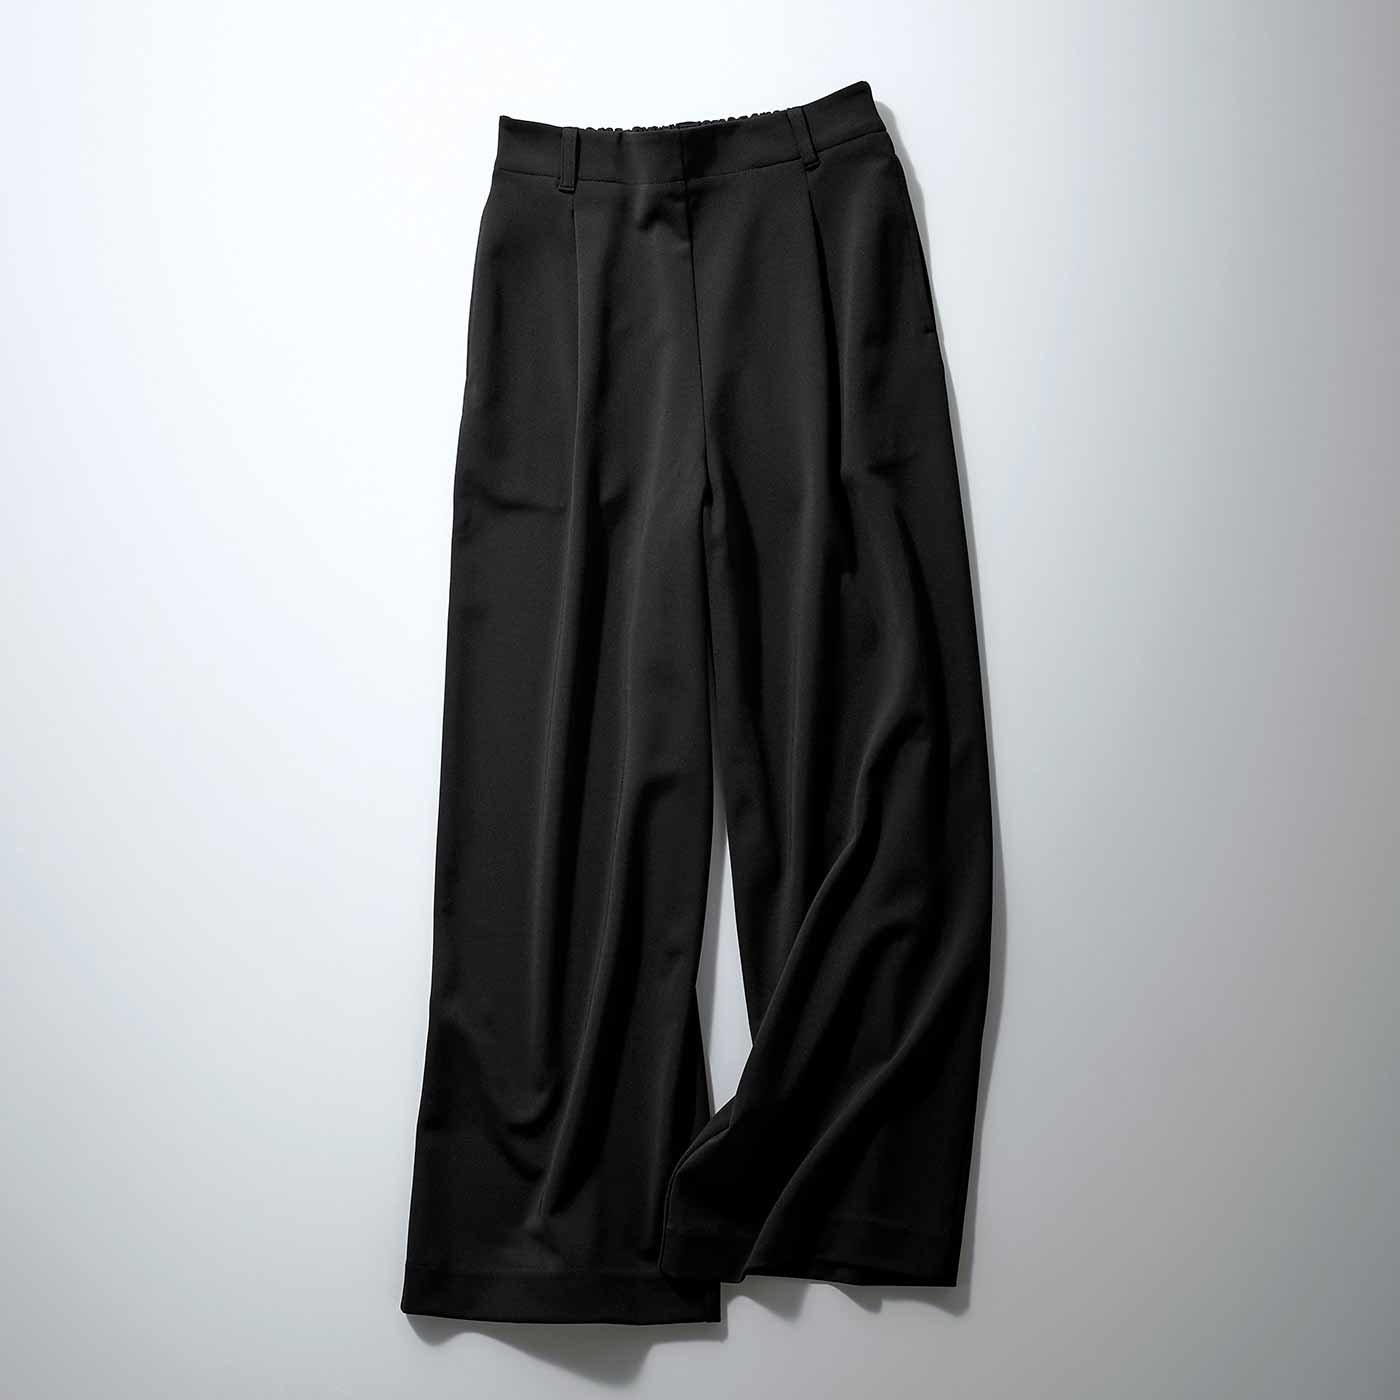 IEDIT[イディット] 花粉リリース&UVカットで快適優秀なバレエフィット(R)パンツ〈ブラック〉